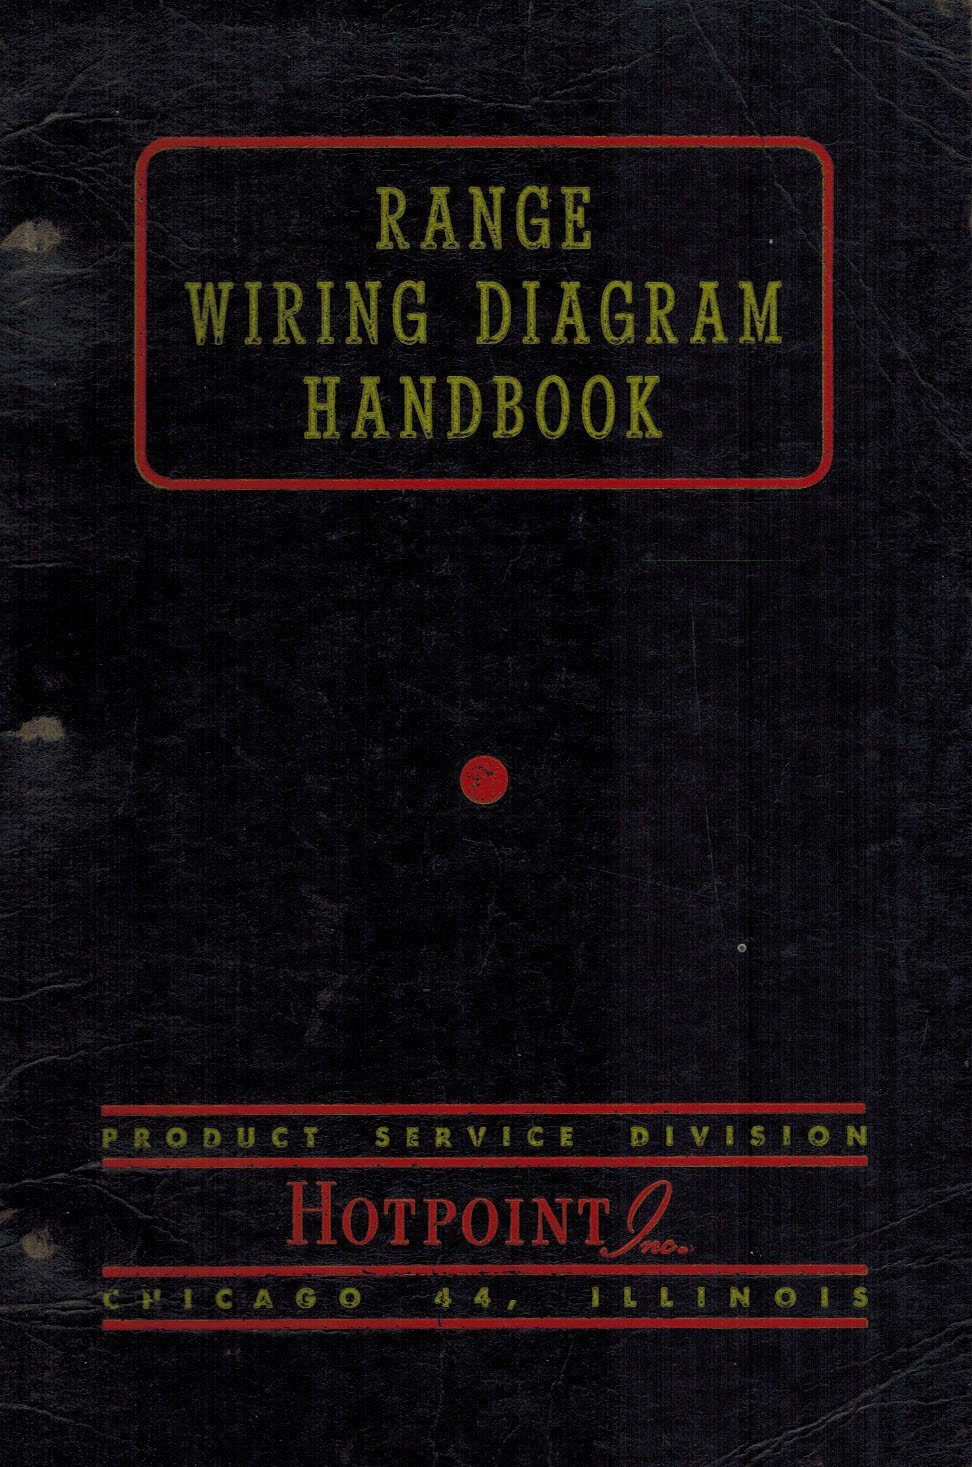 hotpoint range wiring diagram handbook (product service division) paperback  – 1954